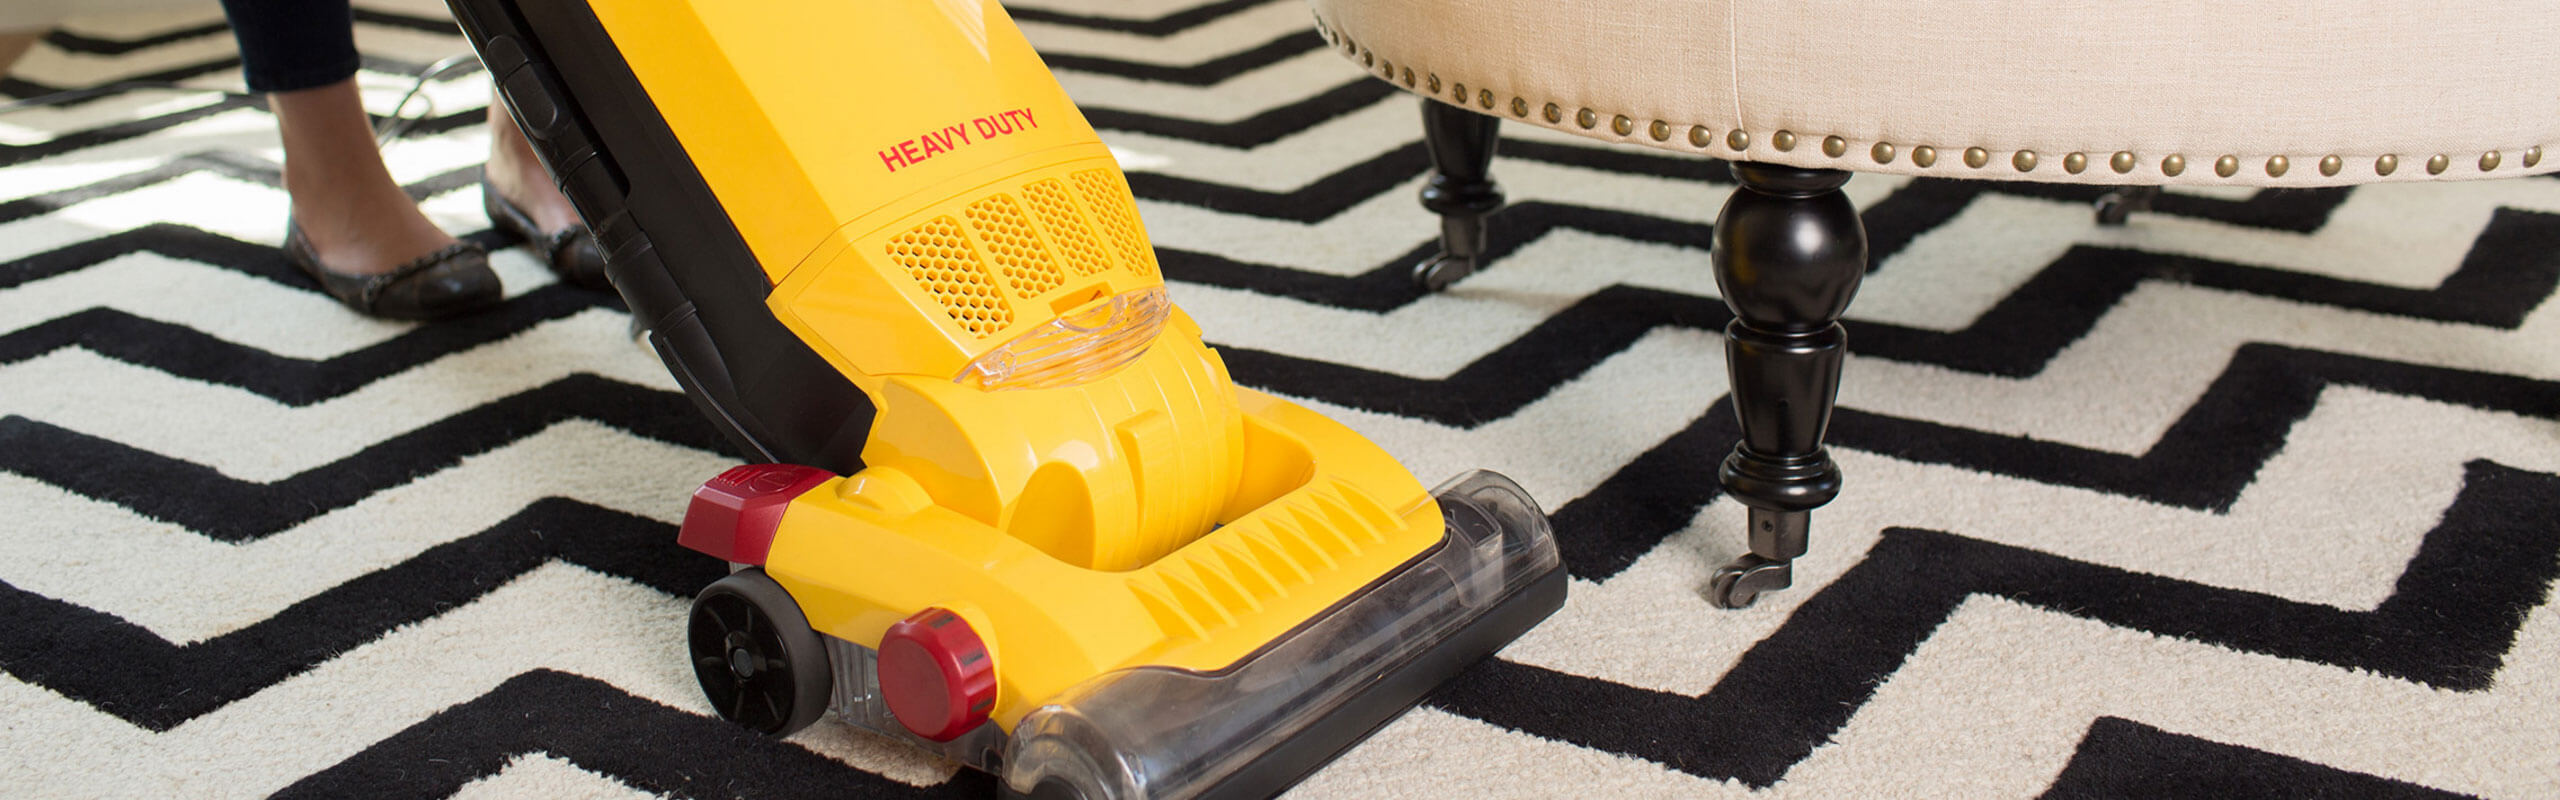 carpet pro scbp-1 manual